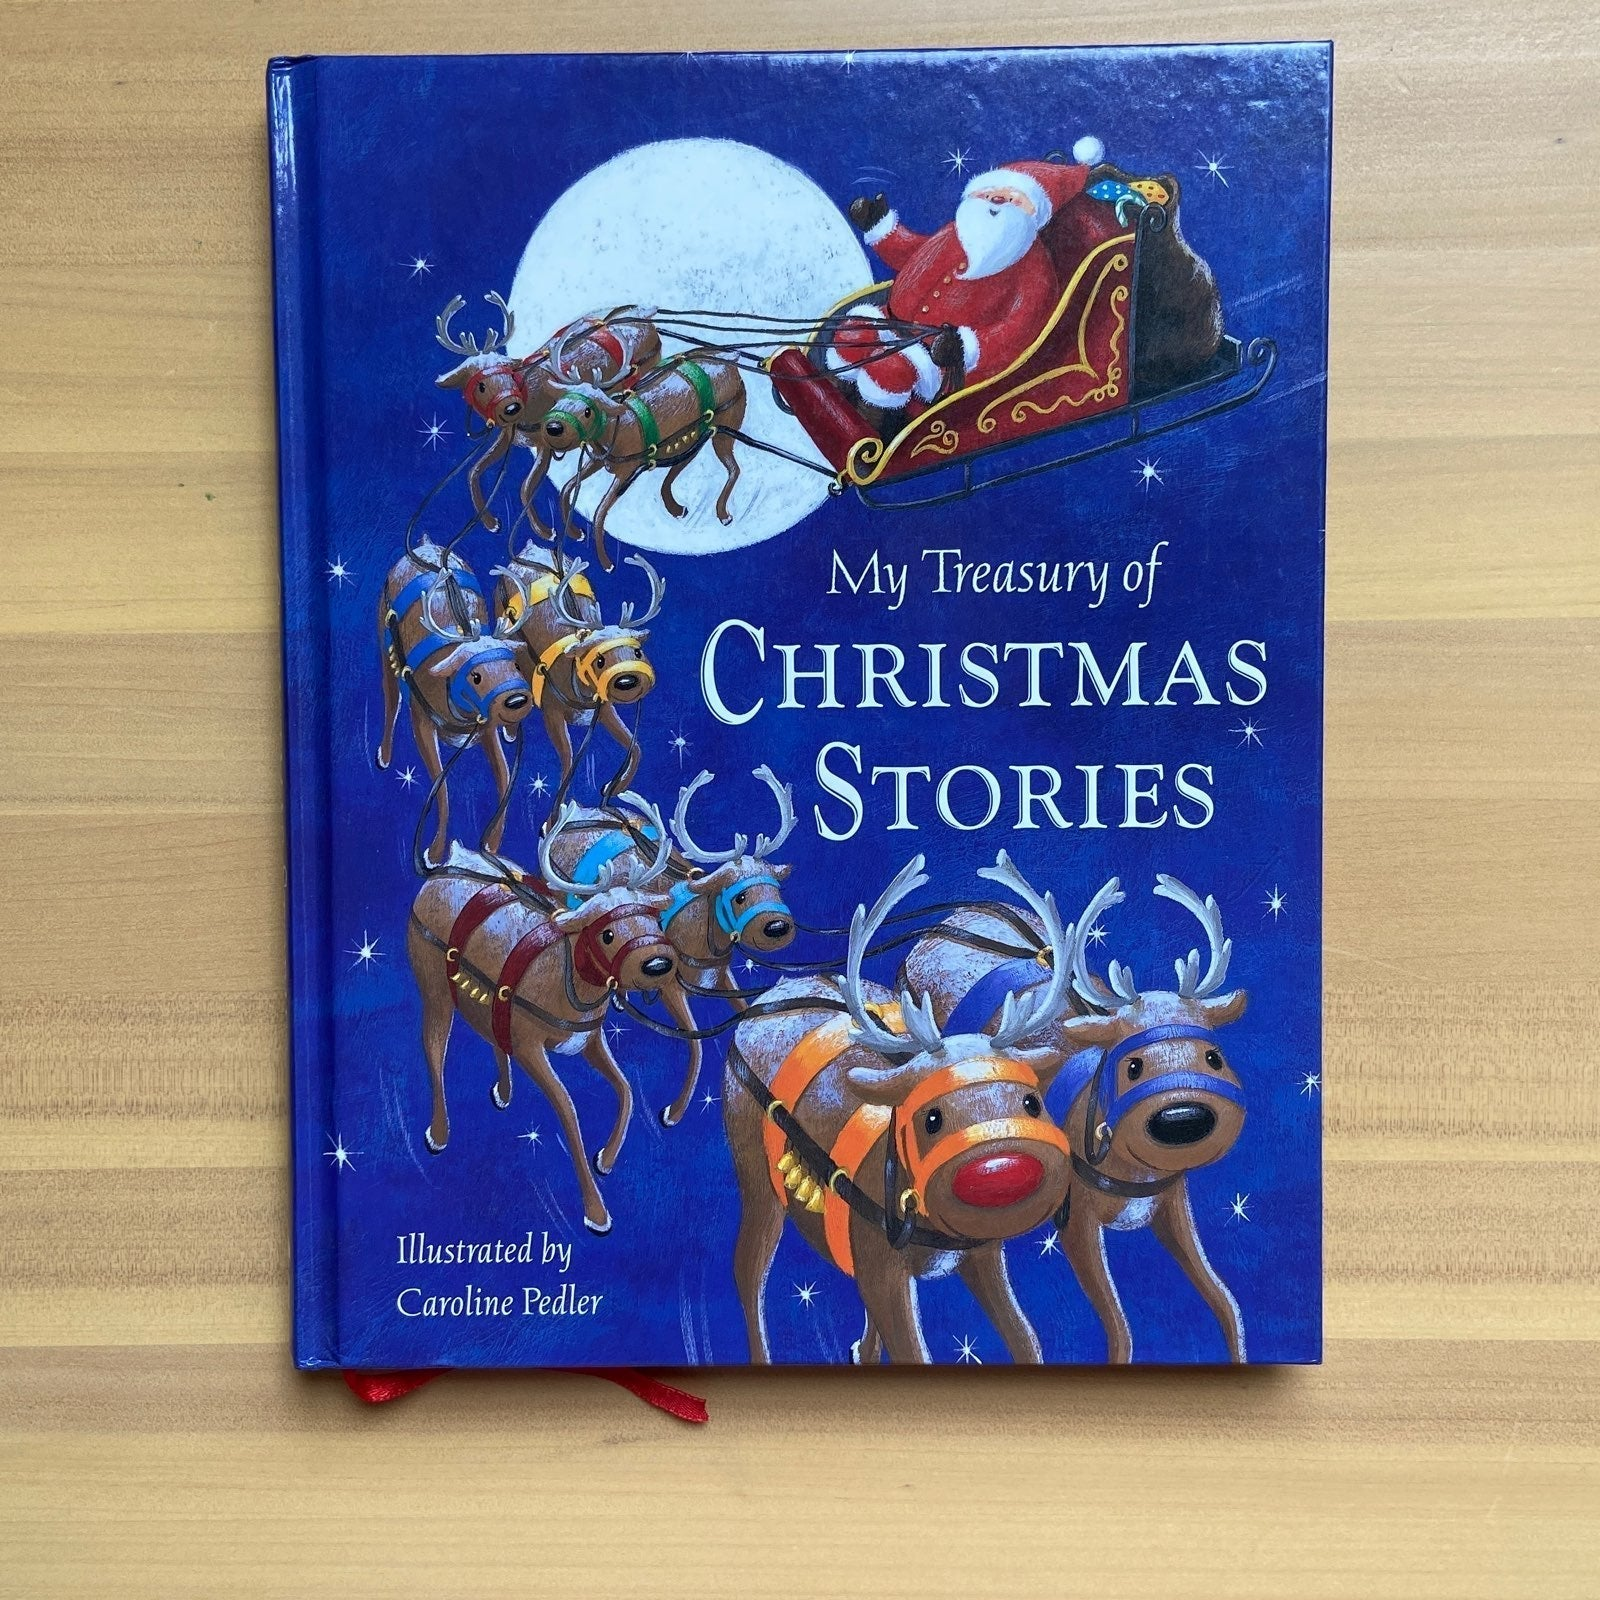 My Treasury of Christmas Stories book